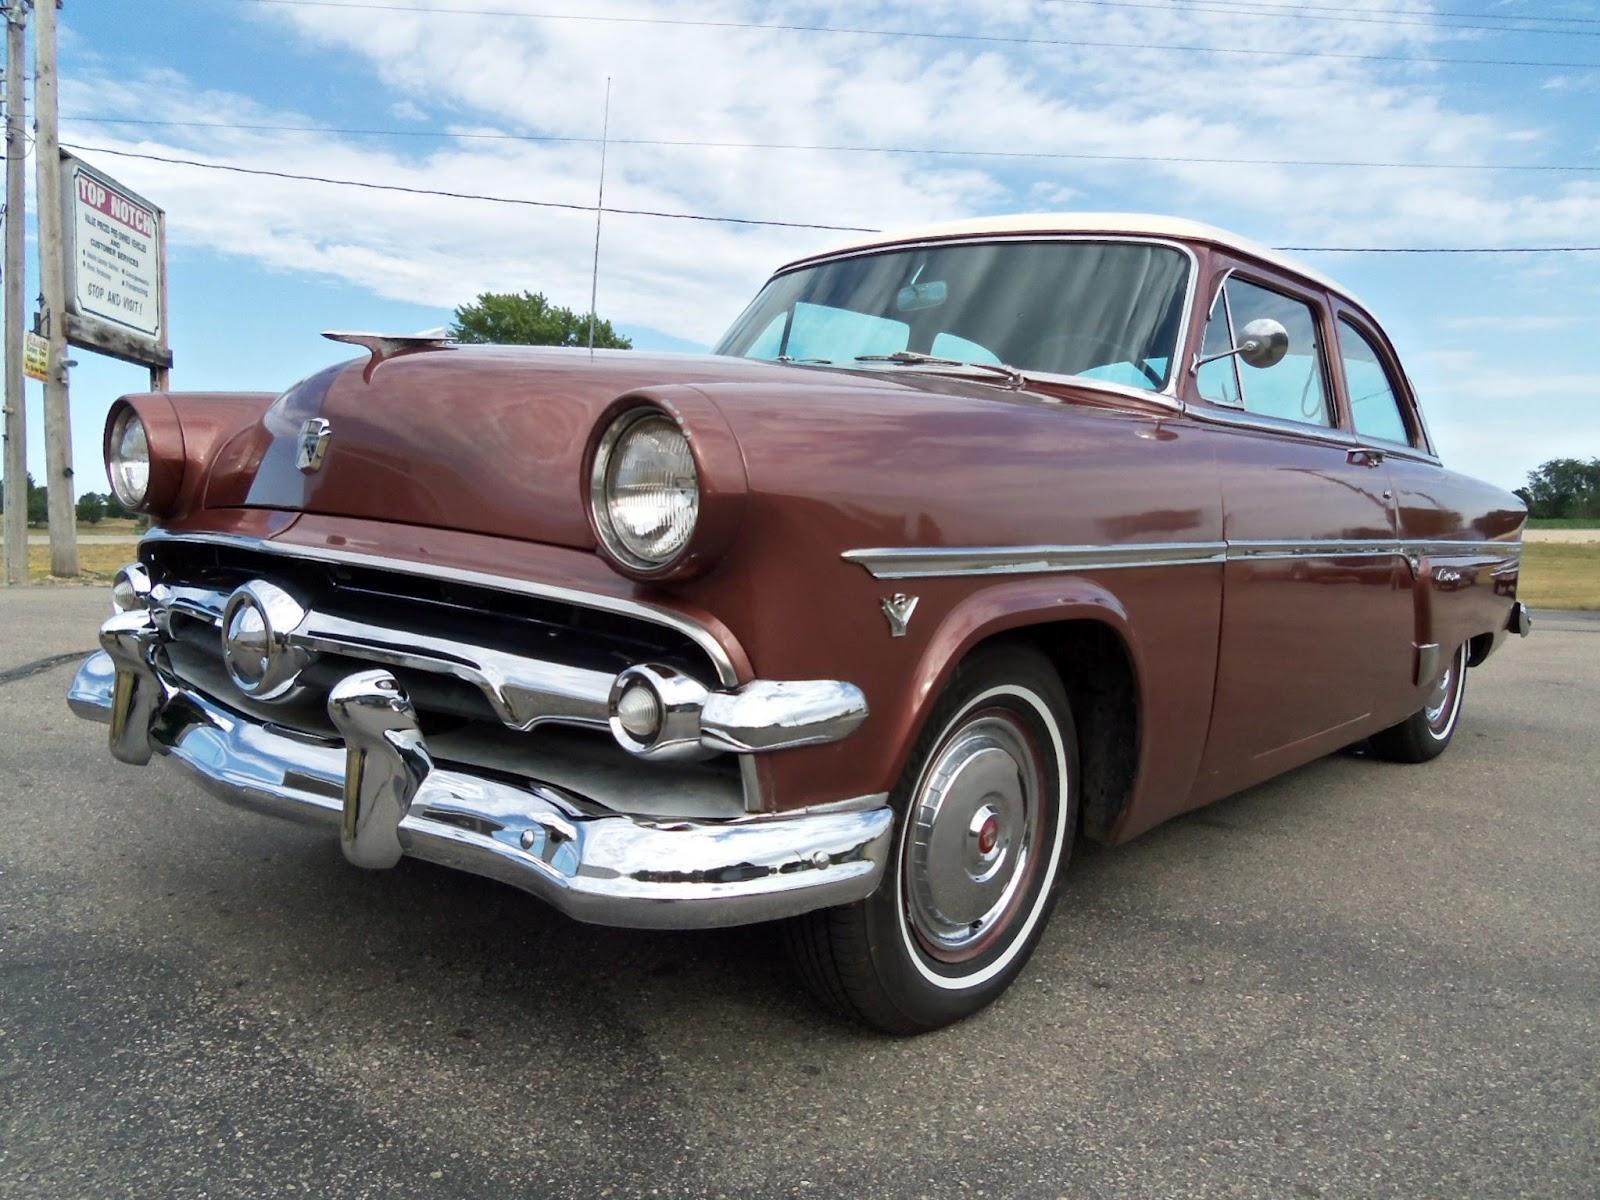 Daily Turismo 10k 1954 Ford Customline Tudor Sedan